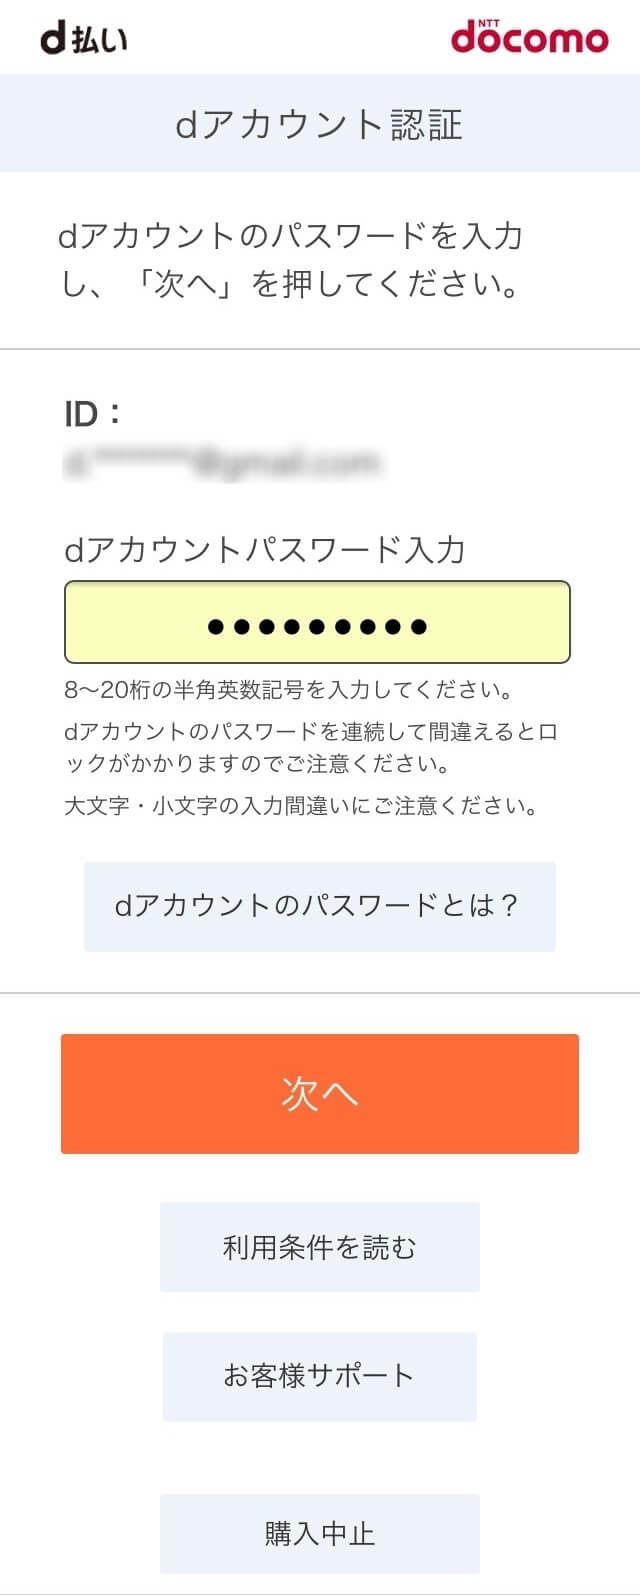 Disney+ プレミアムアクセス4